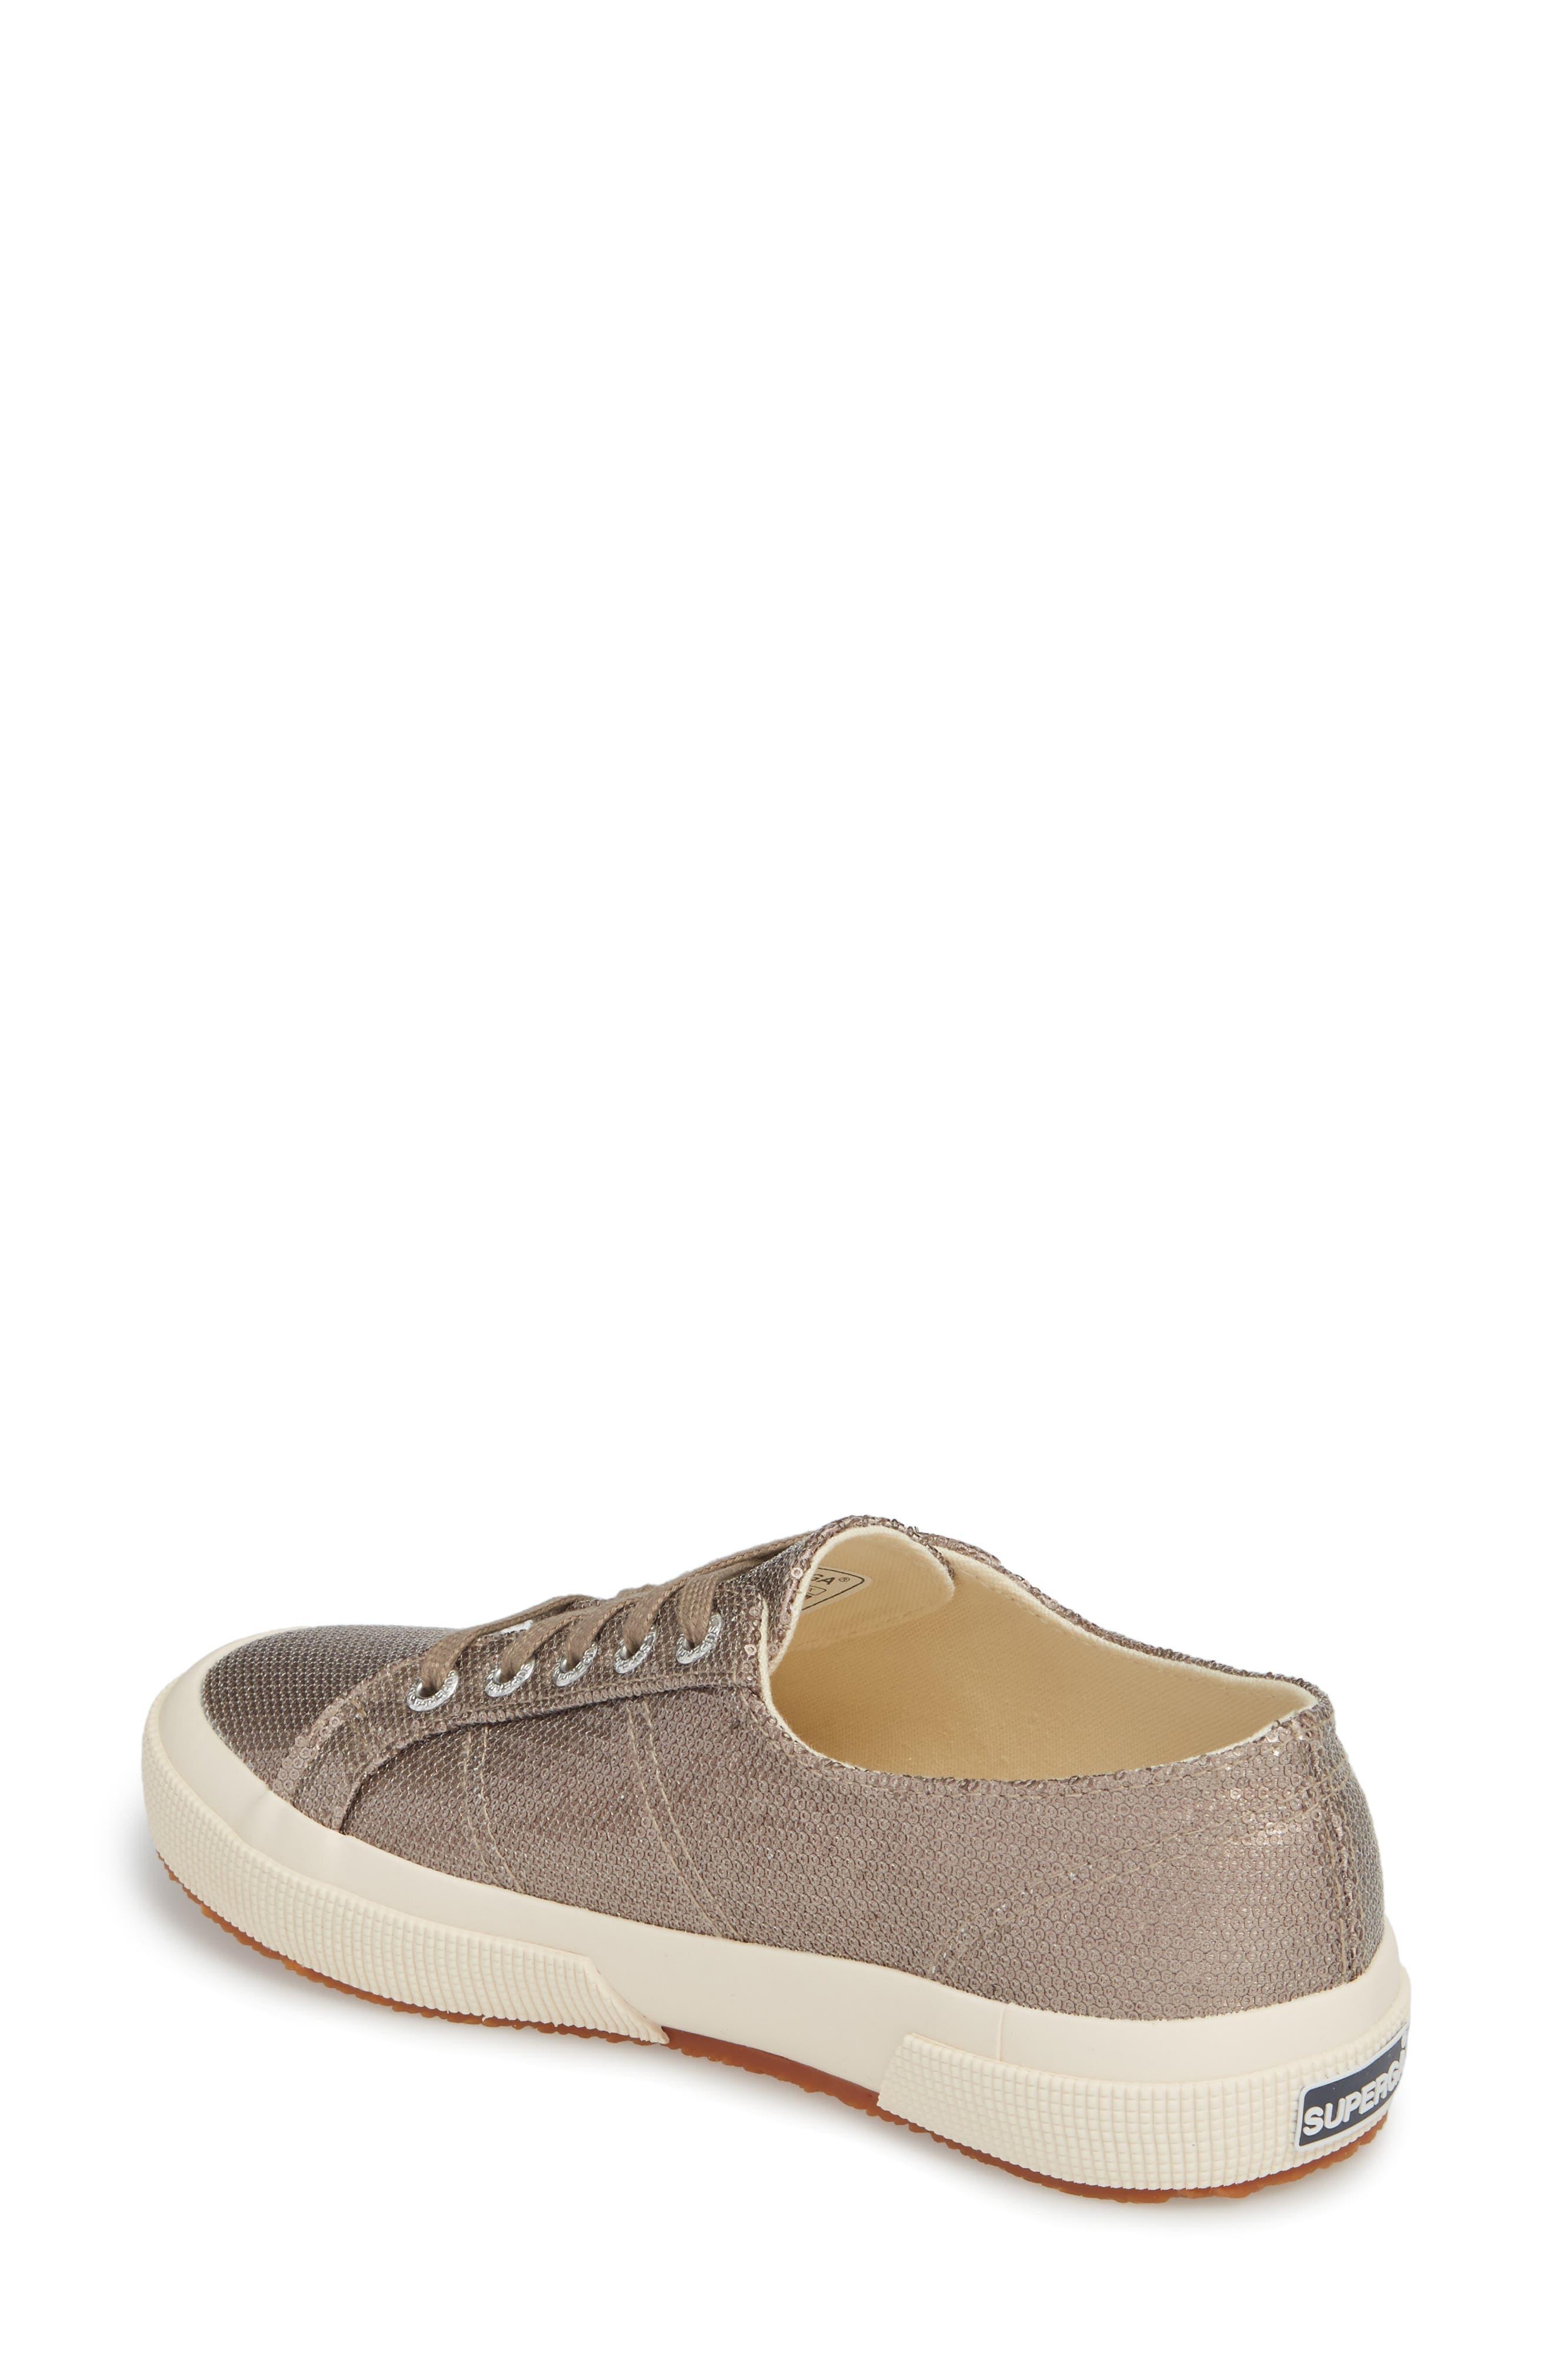 2750 Micro Sequin Sneaker,                             Alternate thumbnail 2, color,                             Bronze